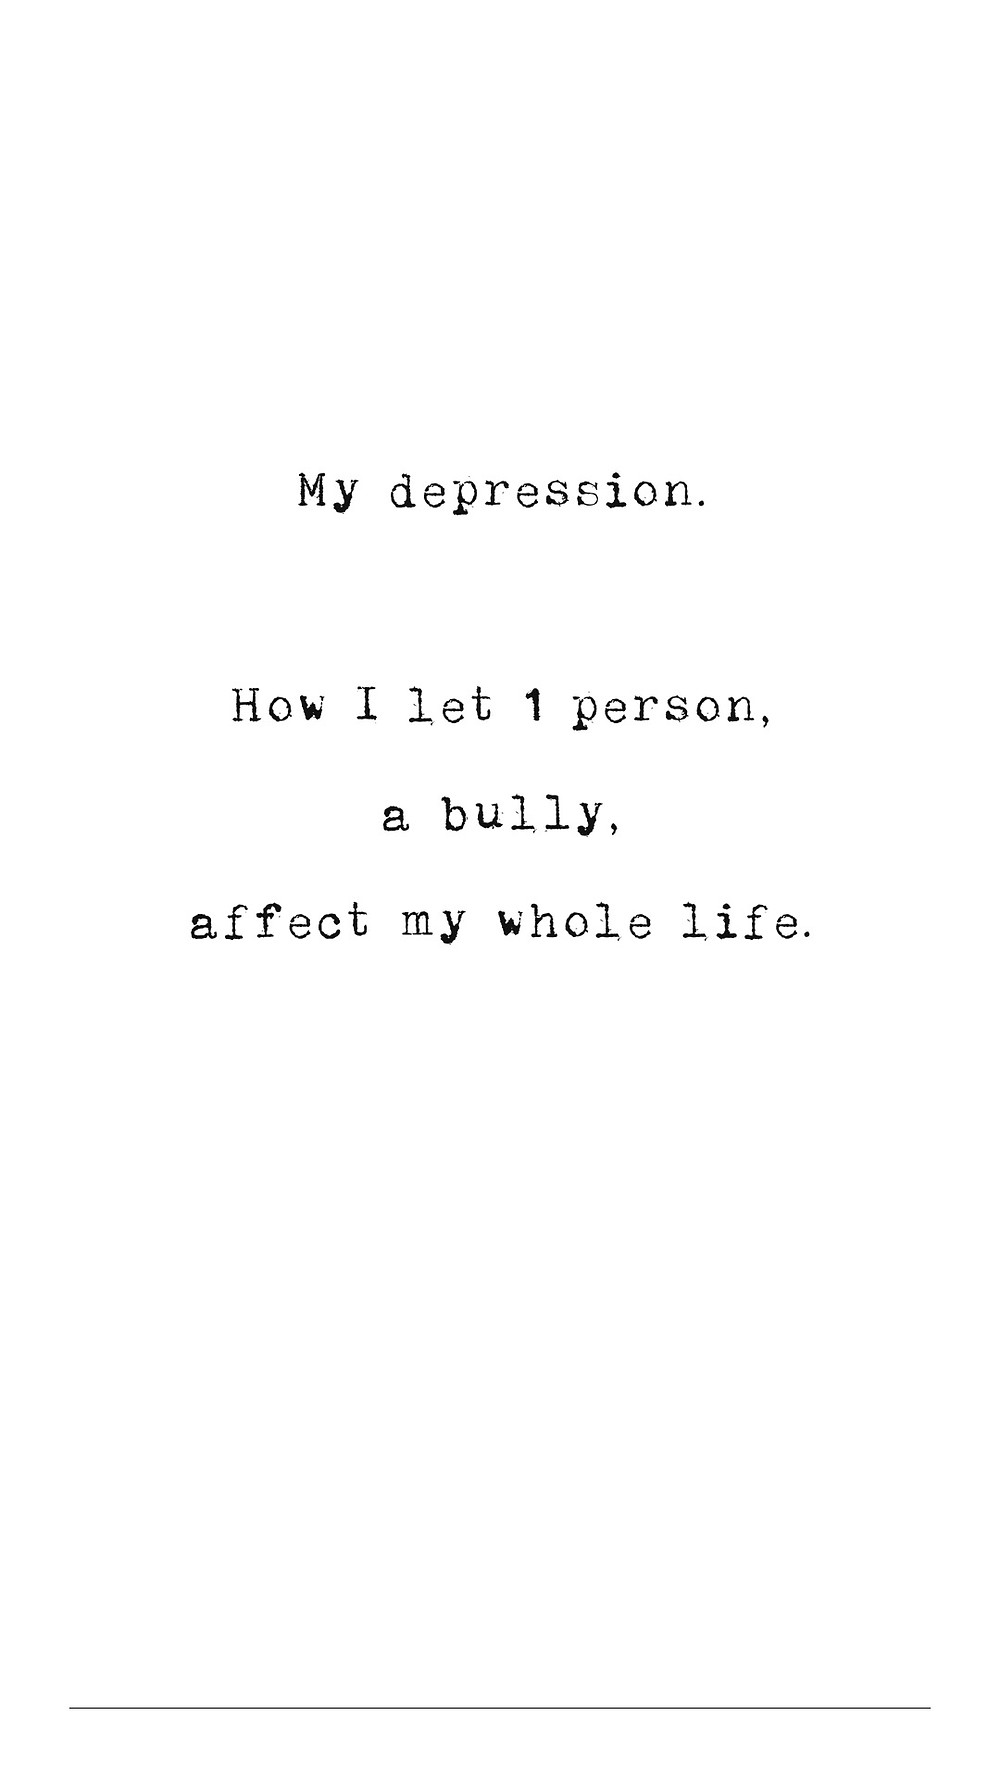 My depression.